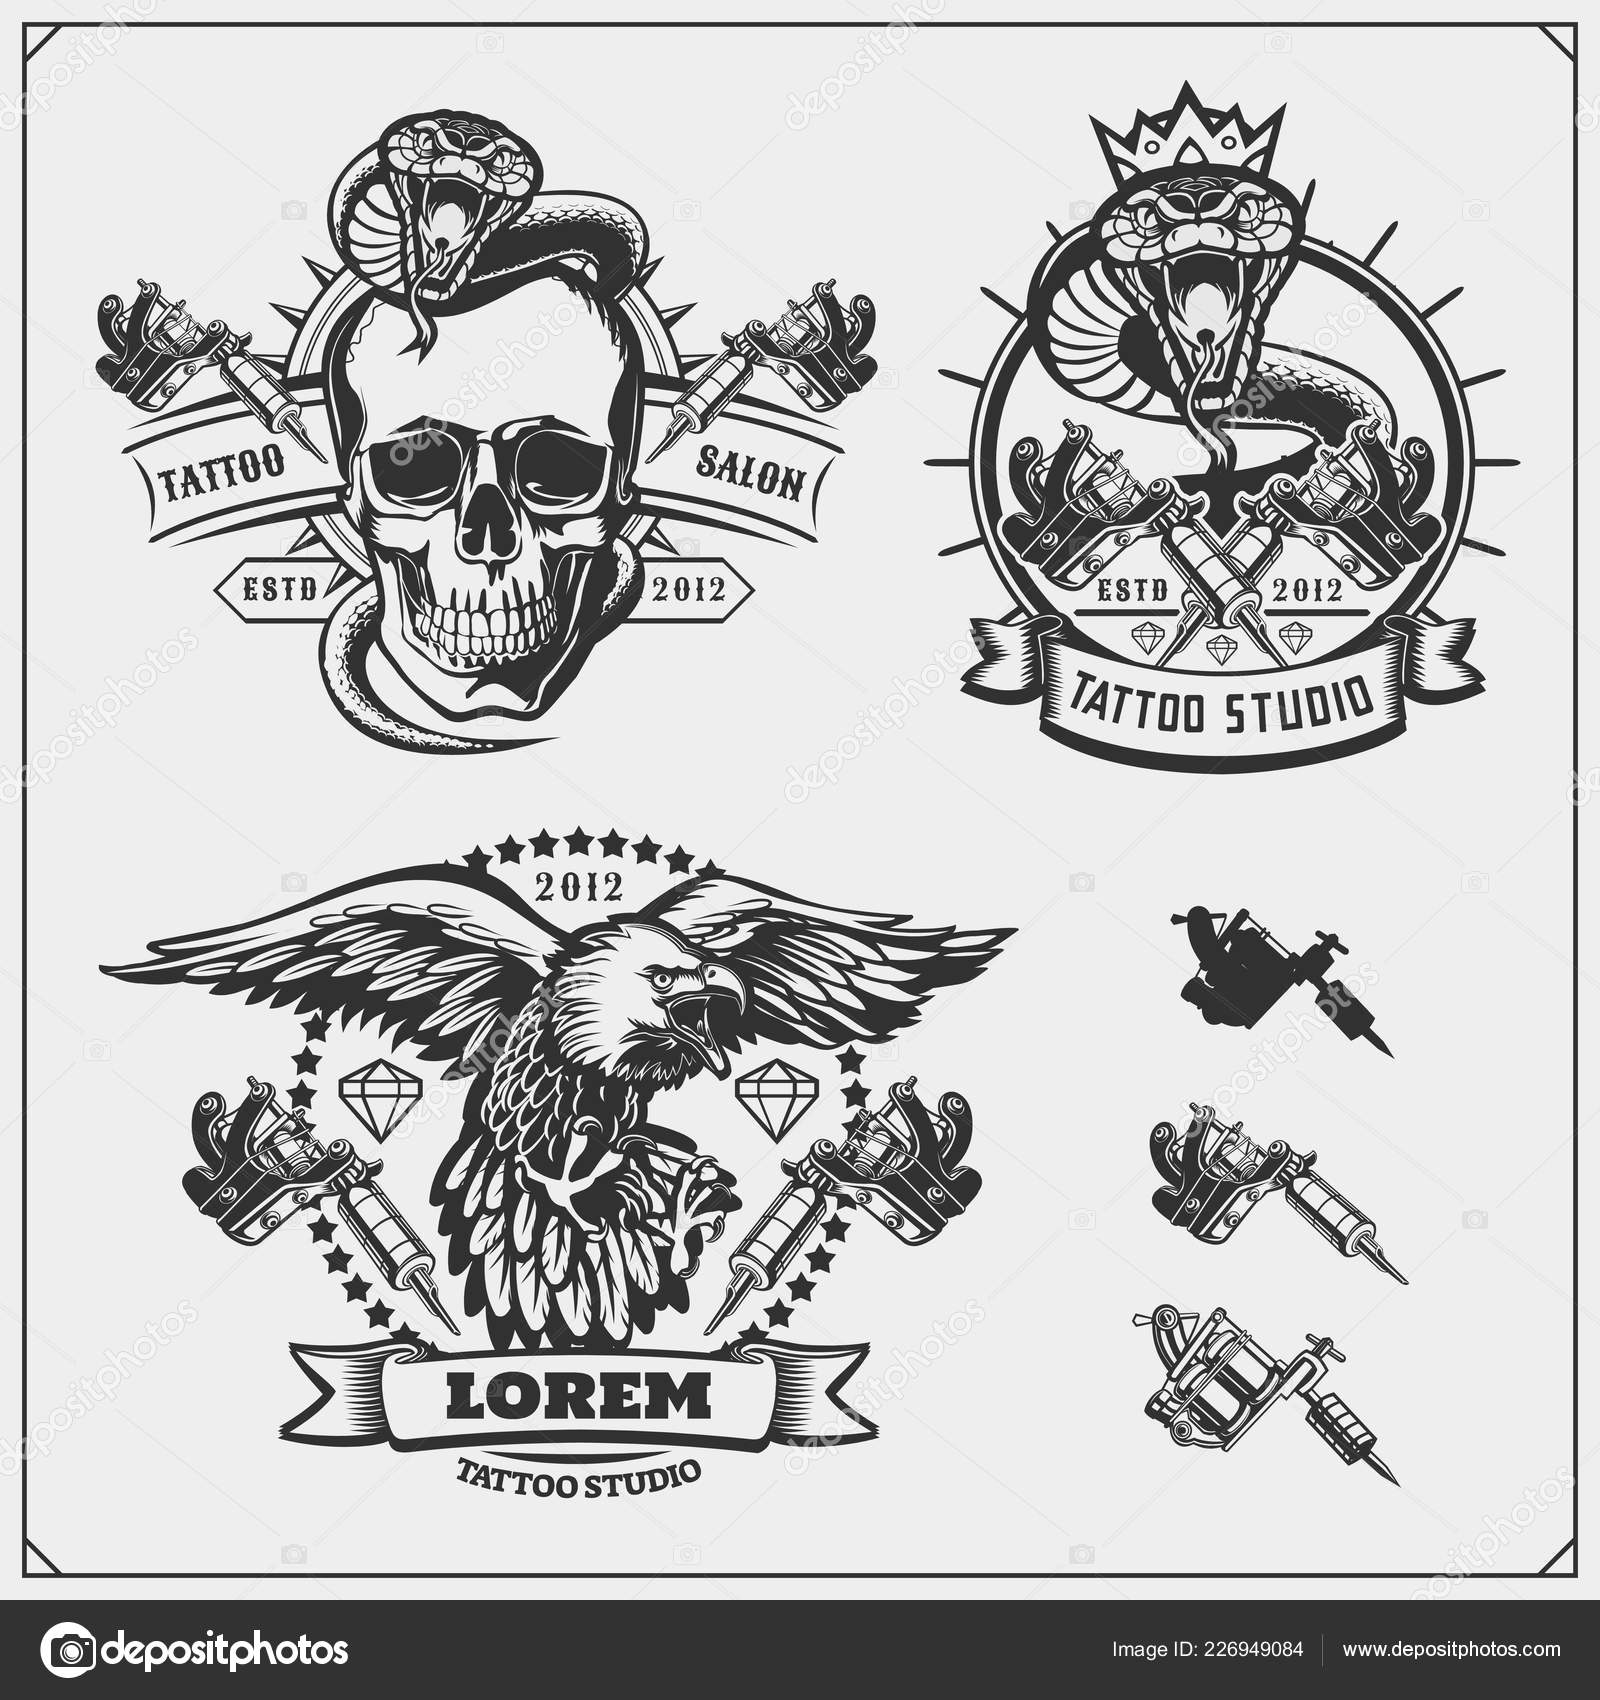 depositphotos_226949084-stock-illustration-set-tattoo-salon-labels-badges.jpg